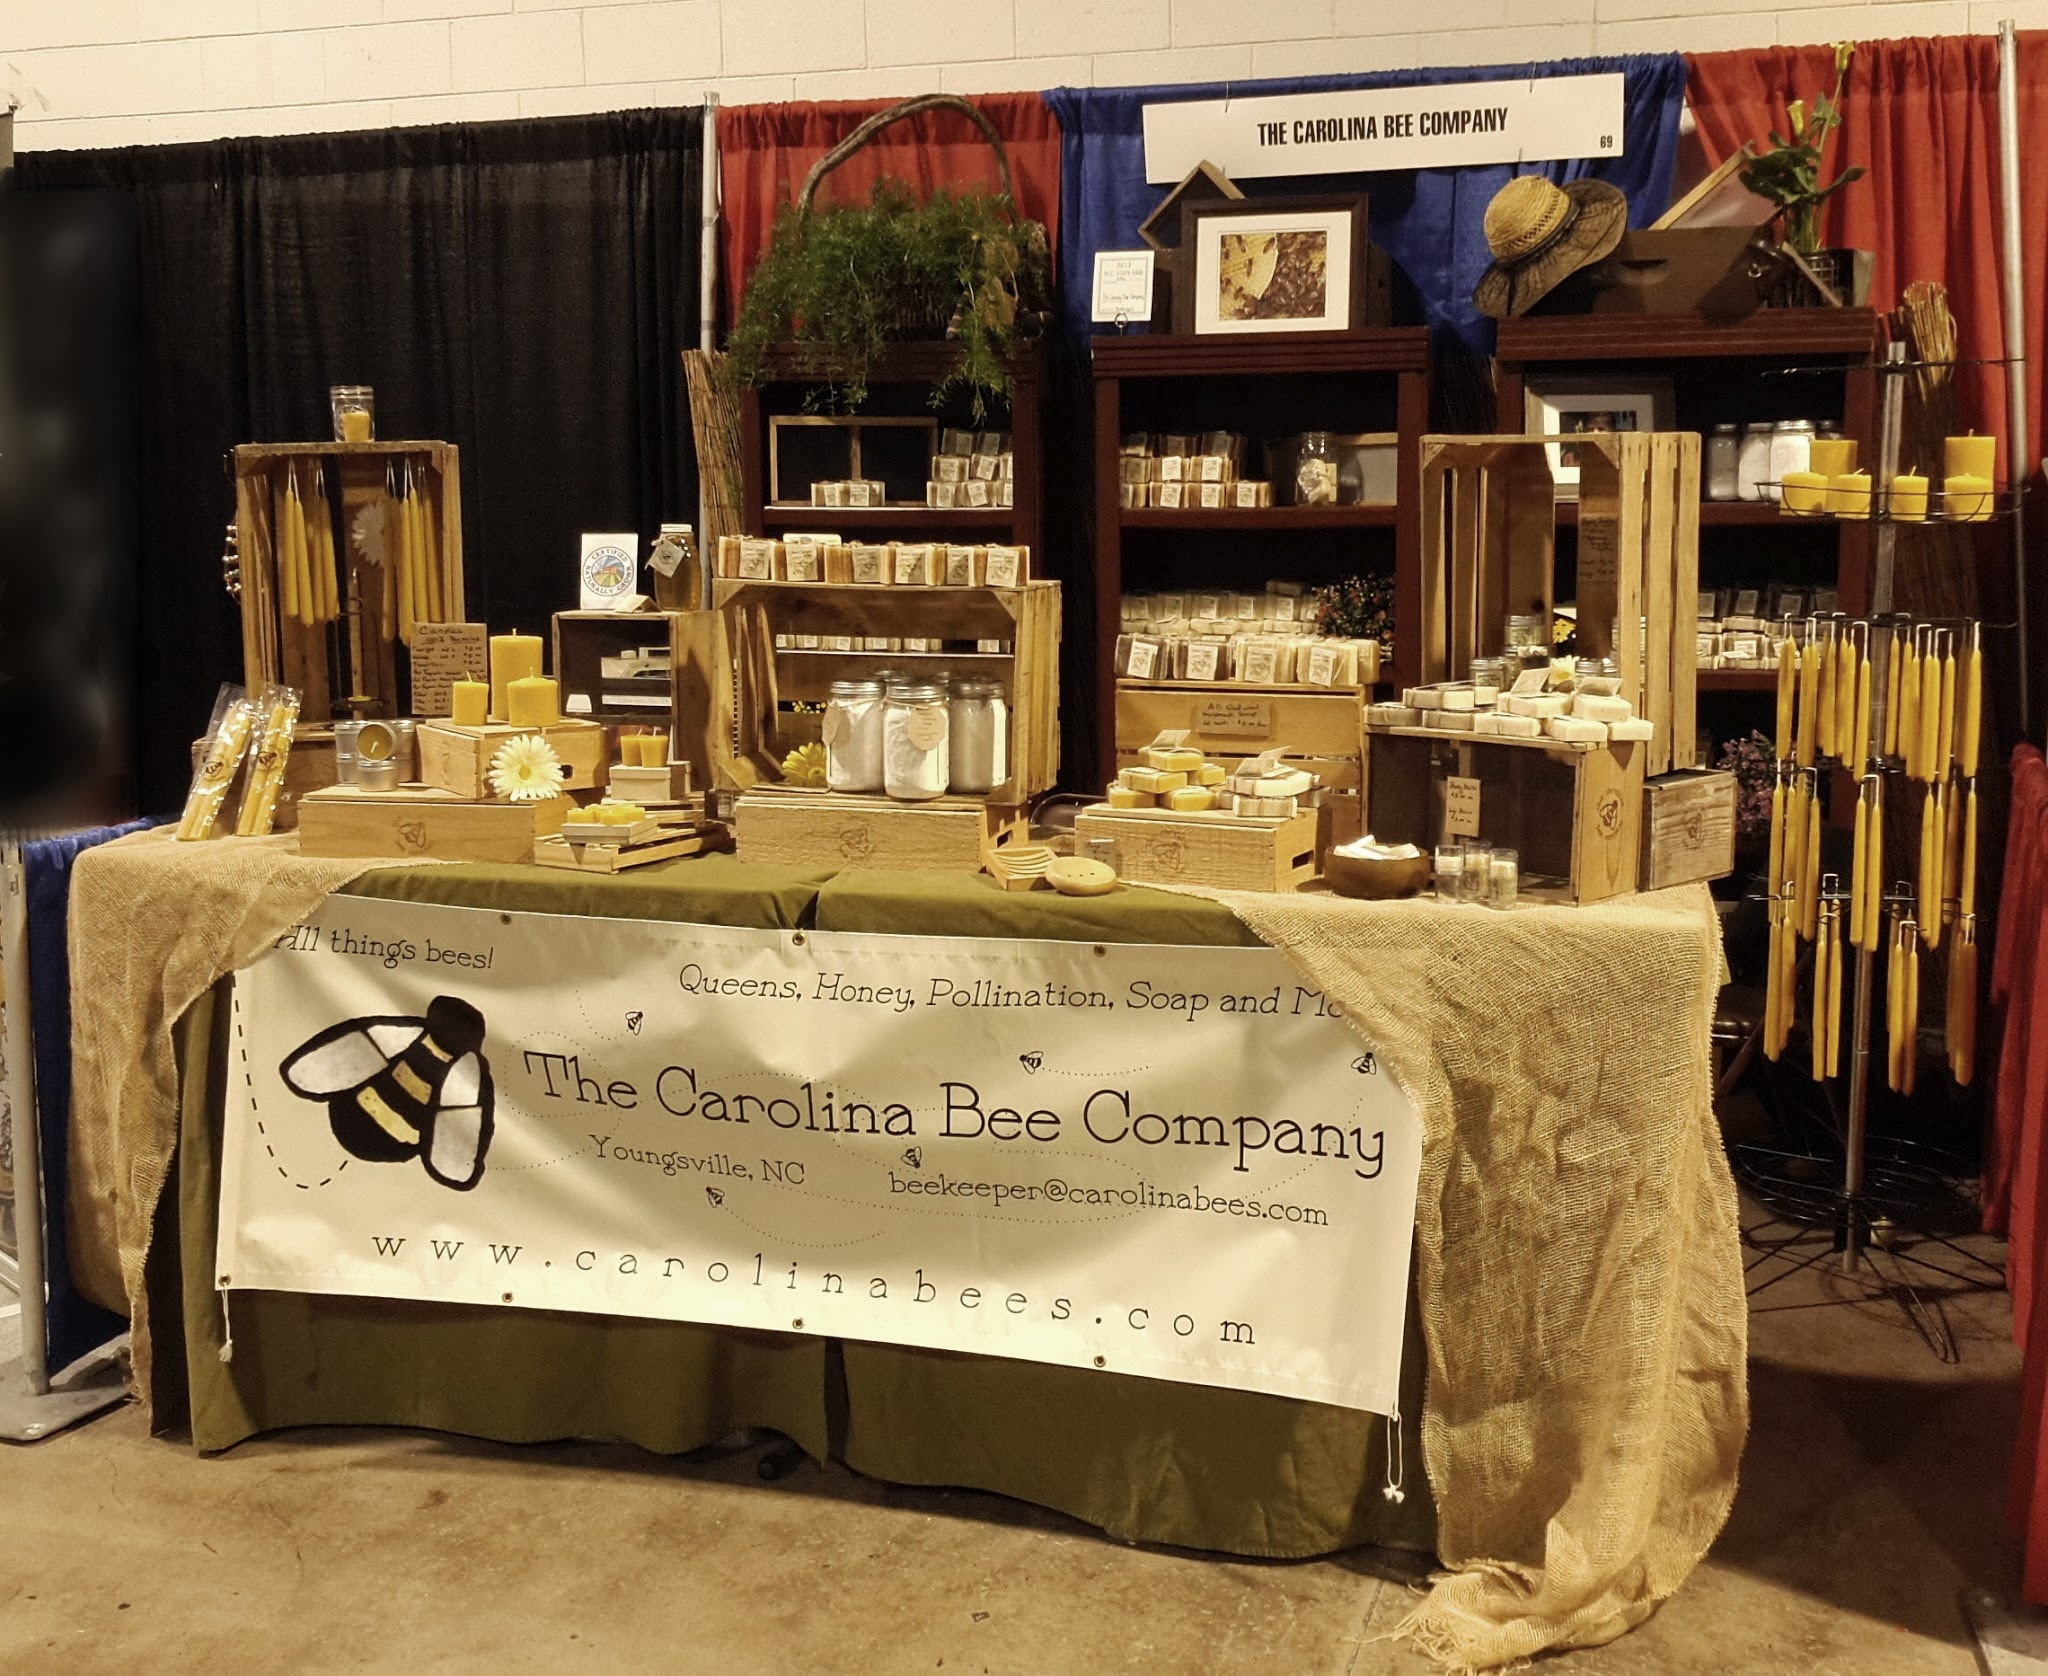 The Carolina Bee Company Store set up at the NC State Fair, 2013